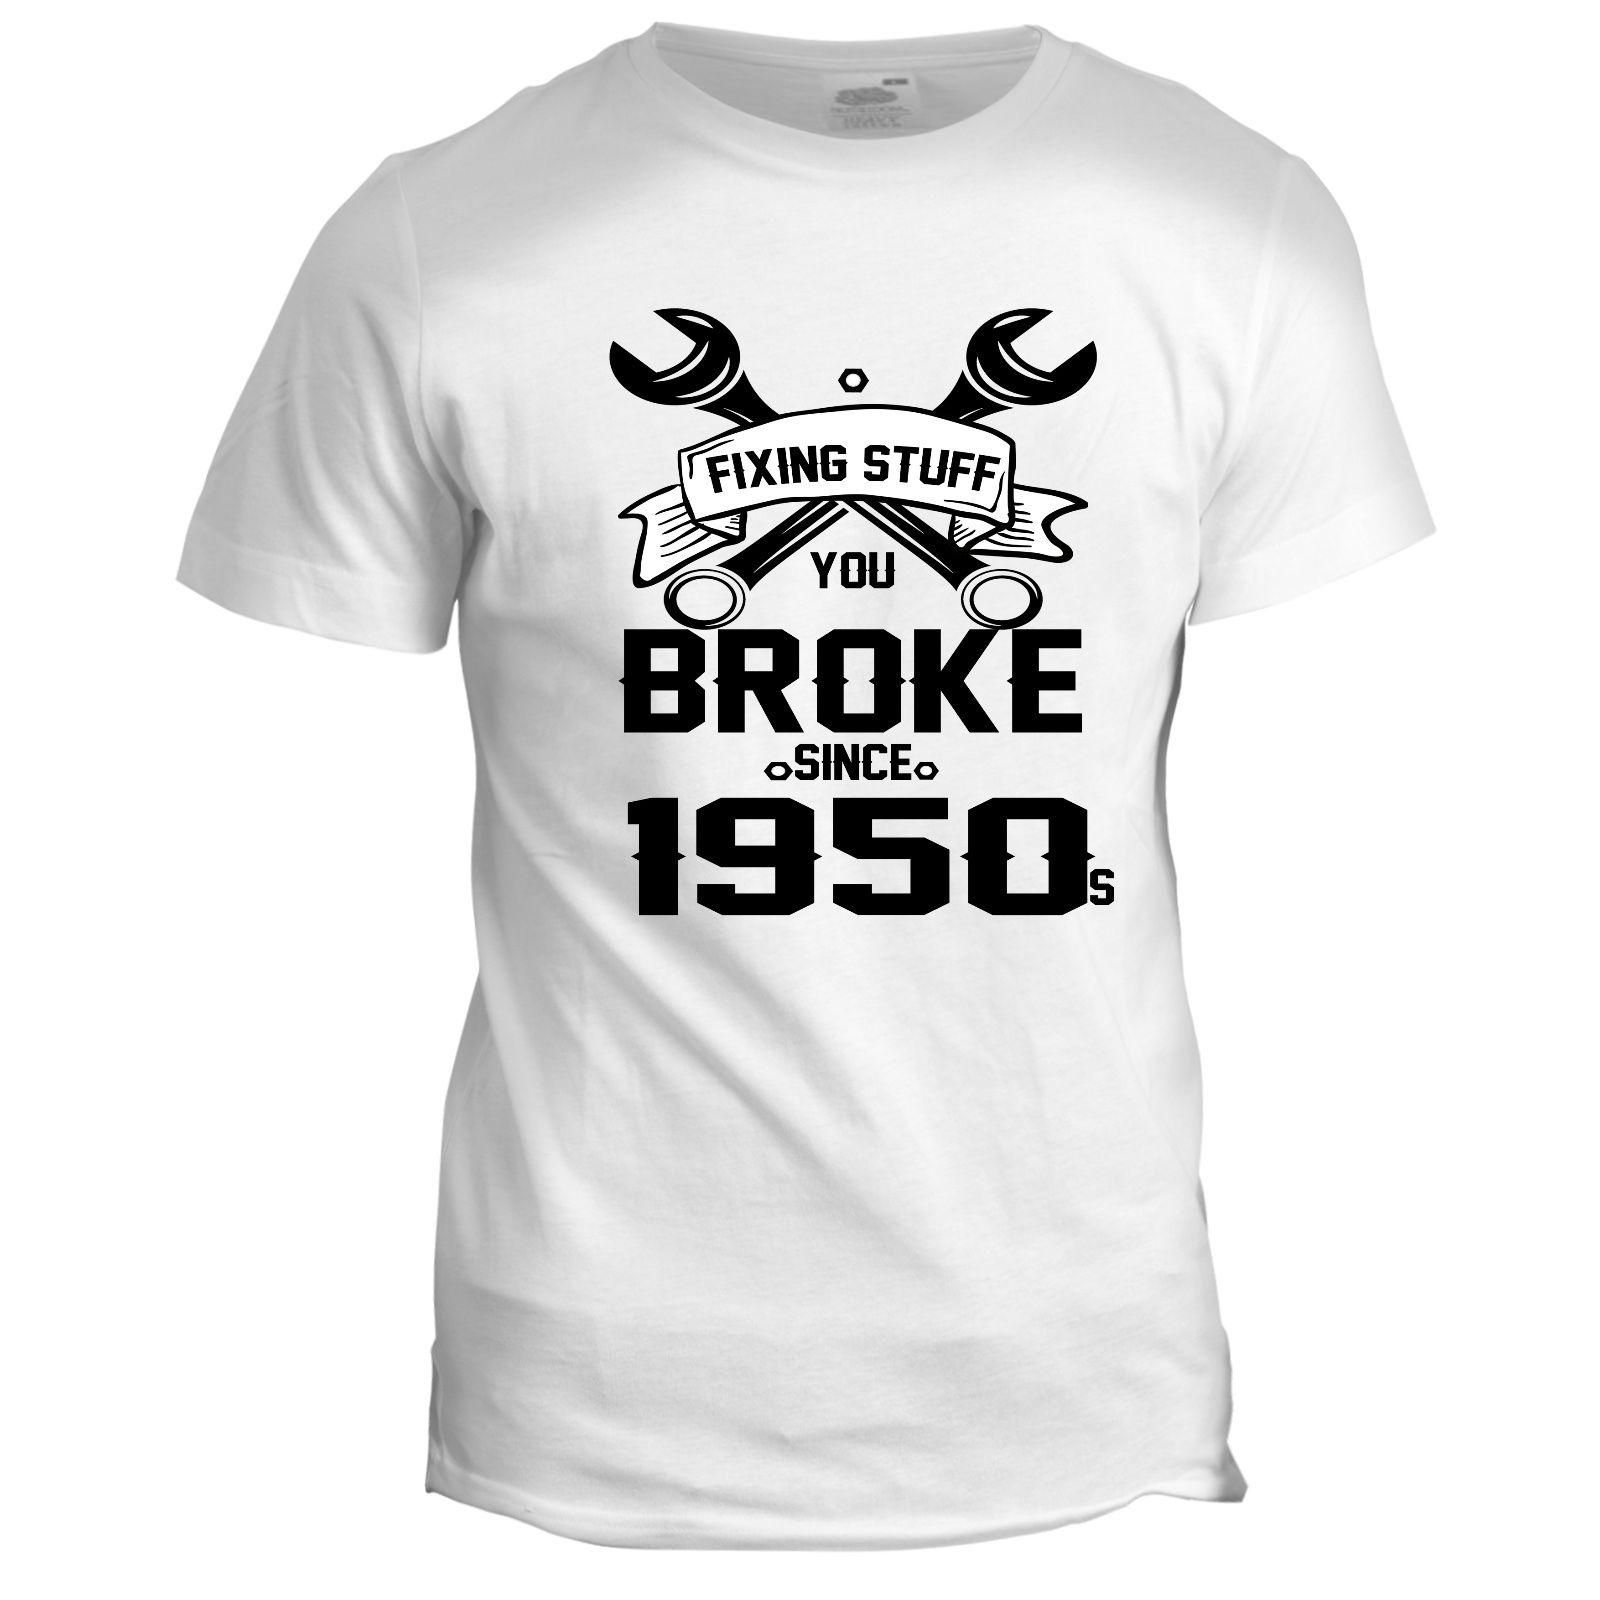 Fixing Stuff Dad Mens Father Grandad Birthday DIY Gift Present 50s T Shirt Cool Casual Pride T Shirt Men Unisex New Fashion Tshirt Cool Funny Shirts One Day ...